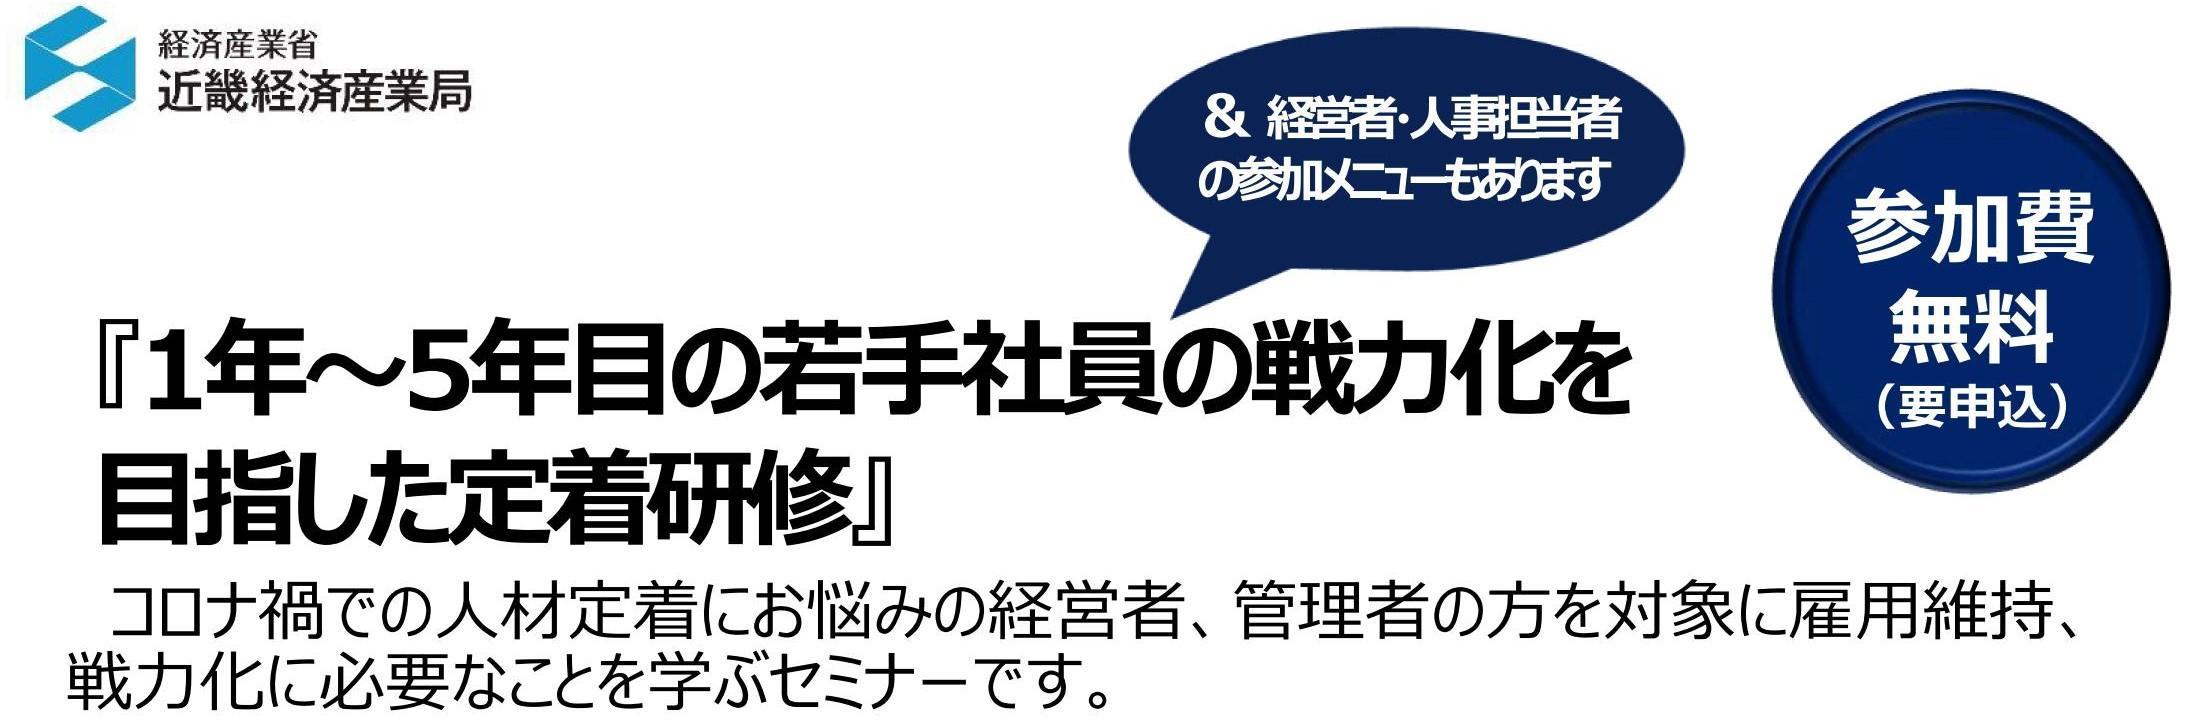 teichaku-osakafu-sitetop.jpg